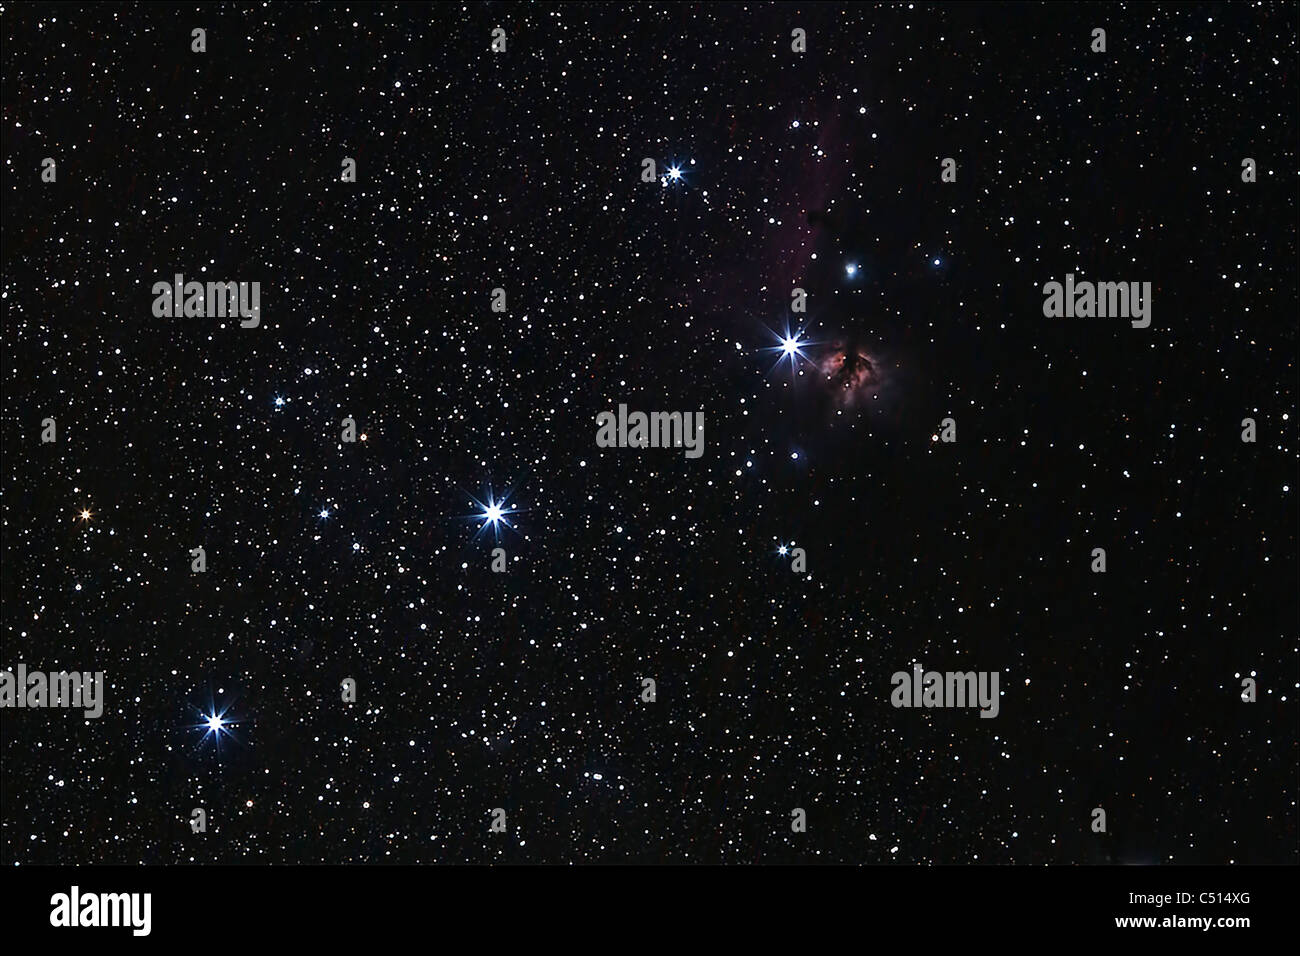 Orion's Belt, Horsehead Nebula and Flame Nebula. - Stock Image